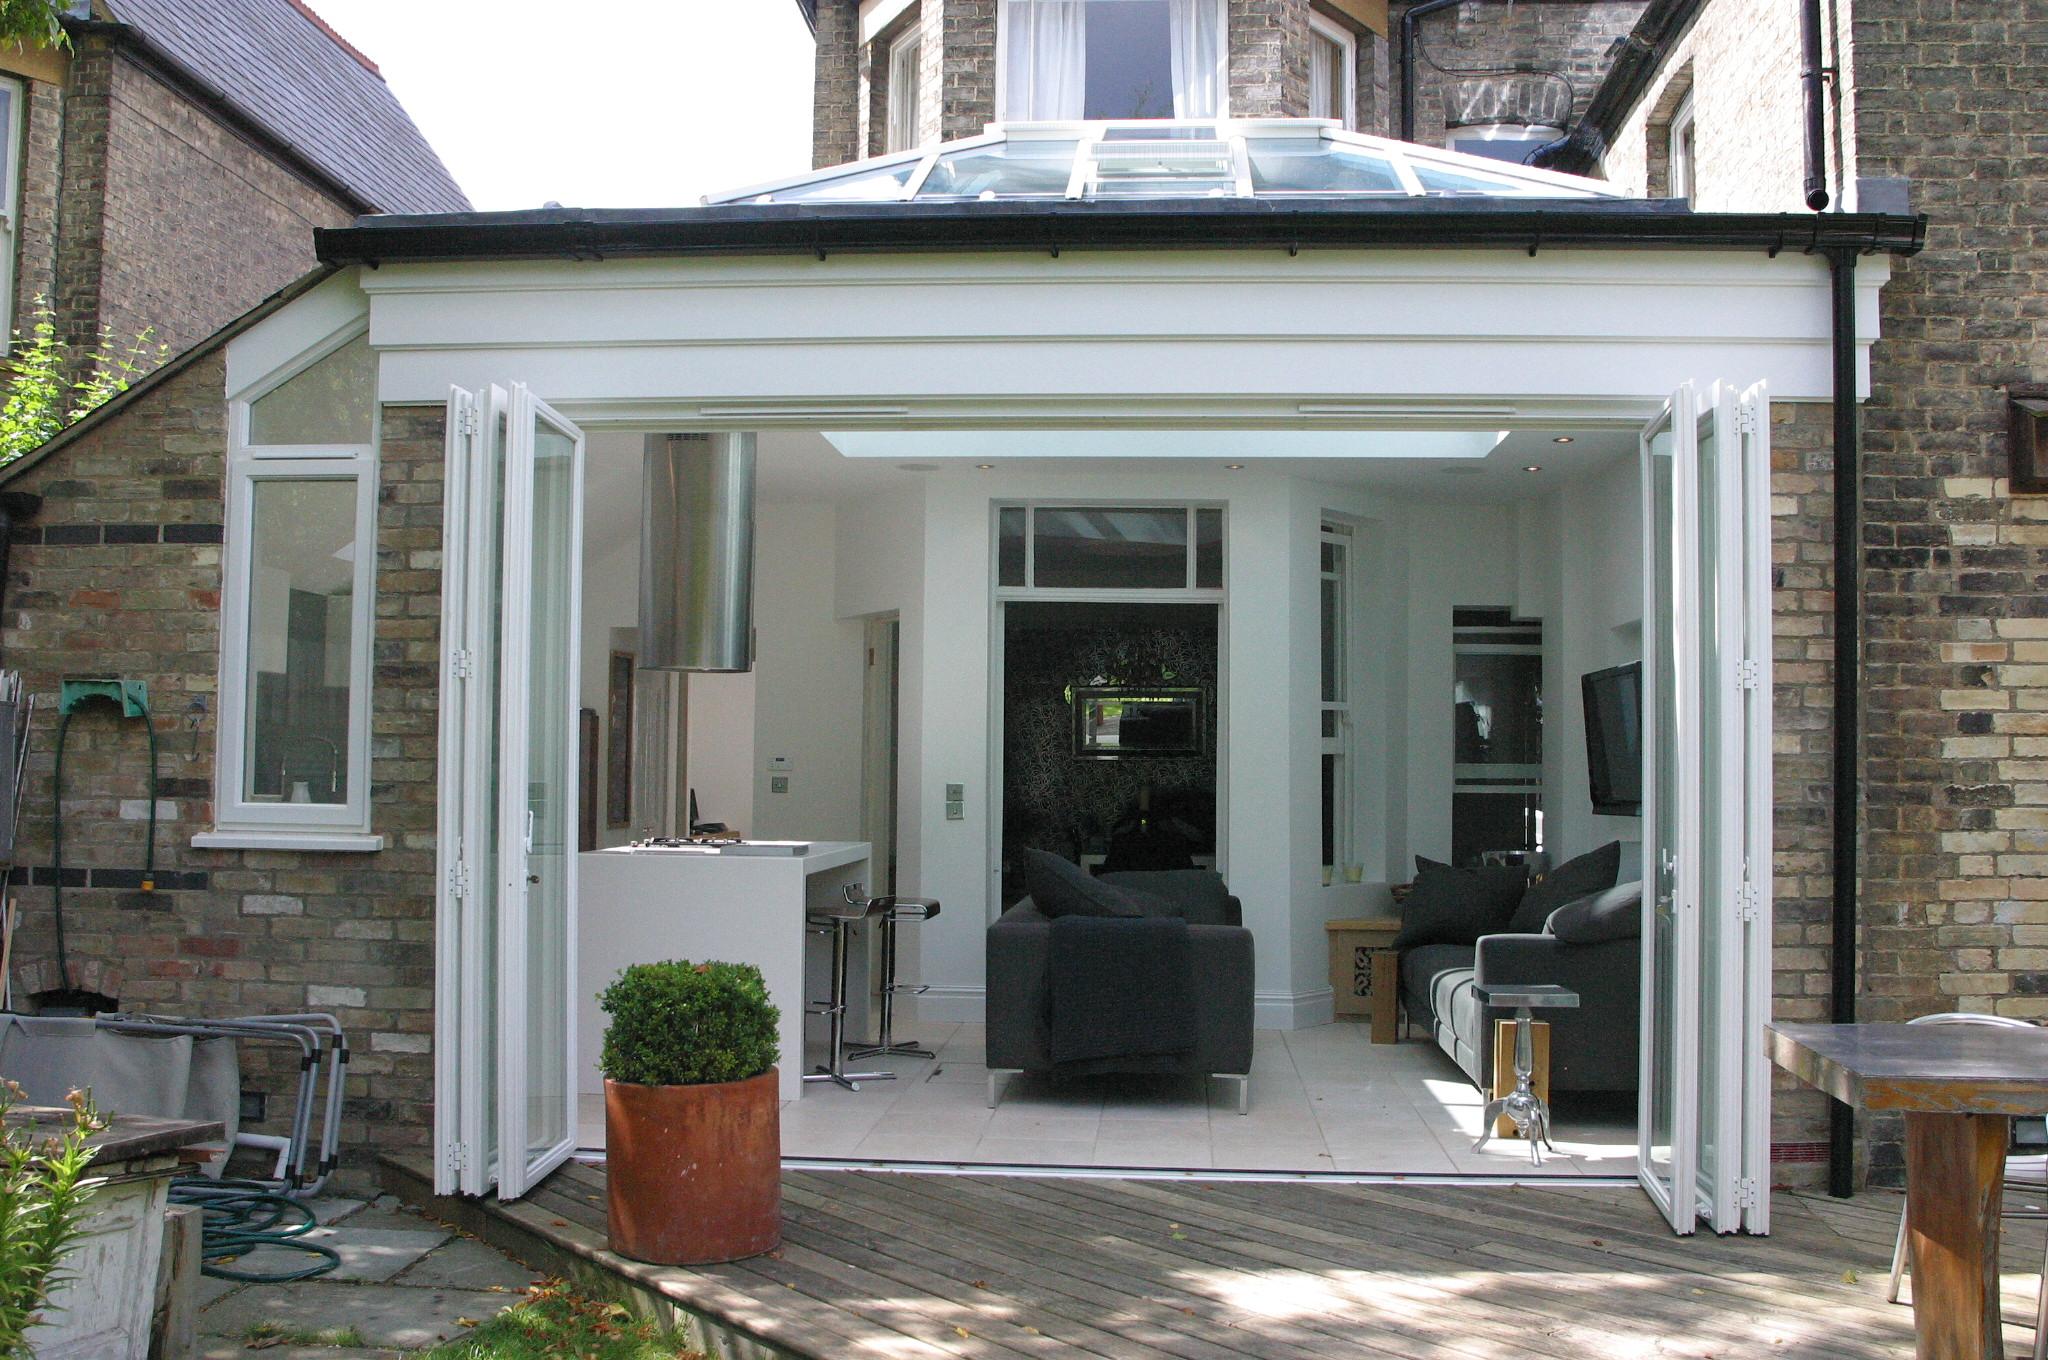 Kitchen extensions project 5 heritage orangeries for Concertina doors